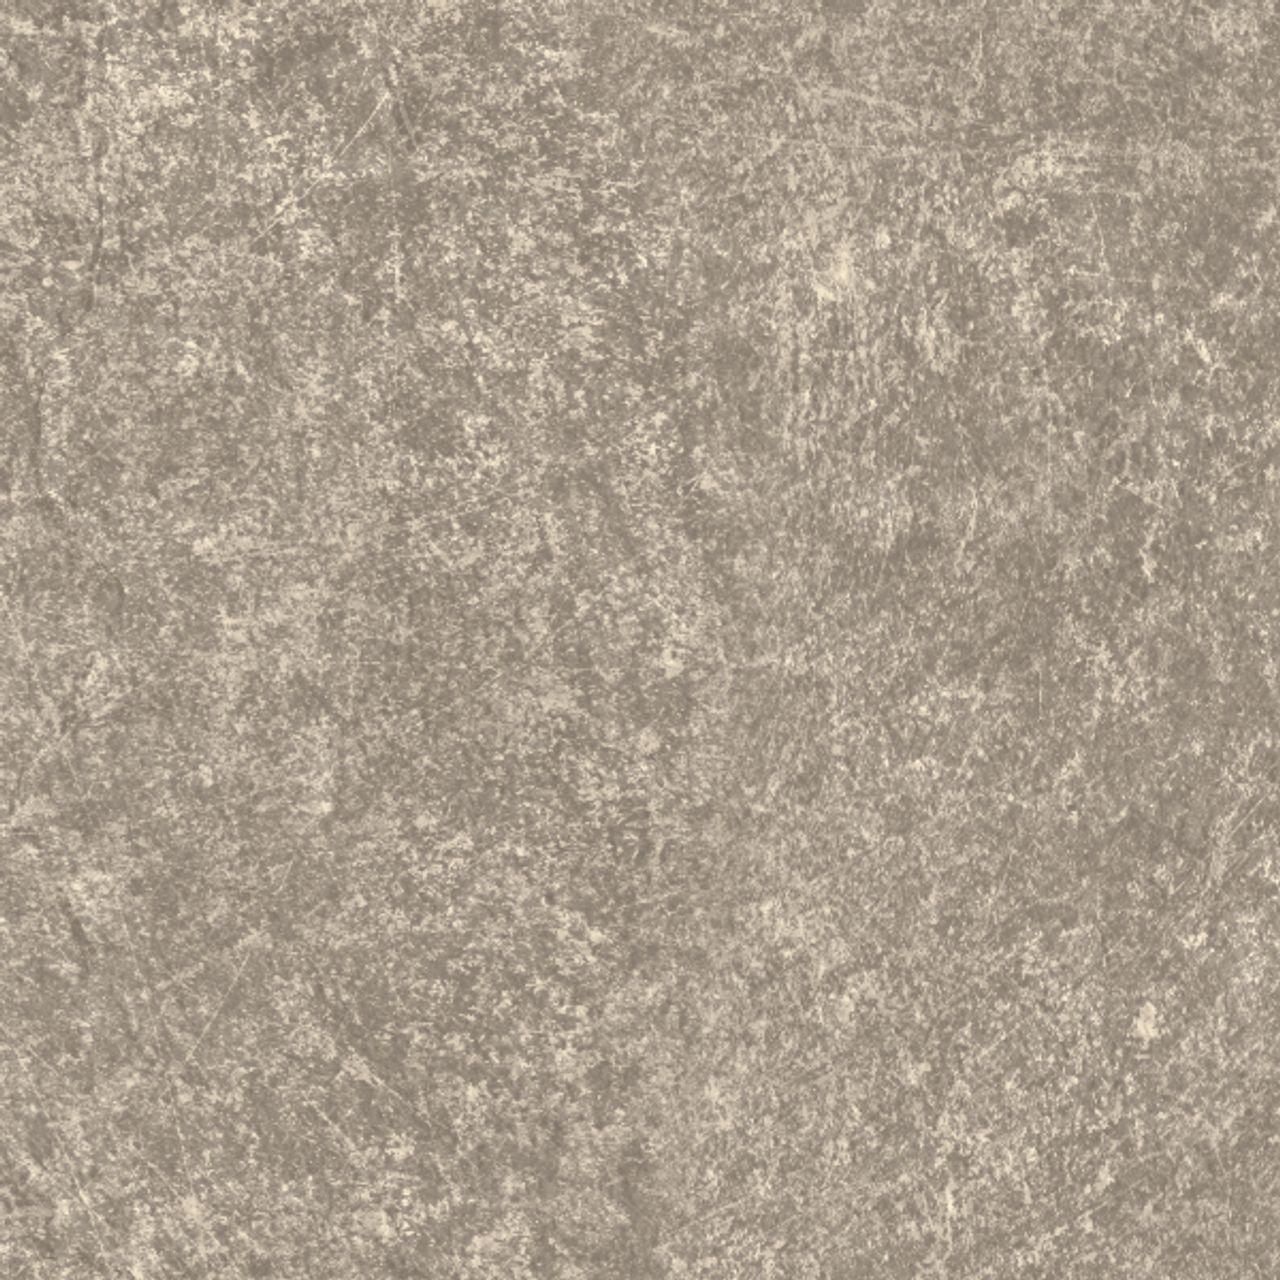 KNA13 Silver Quartzite